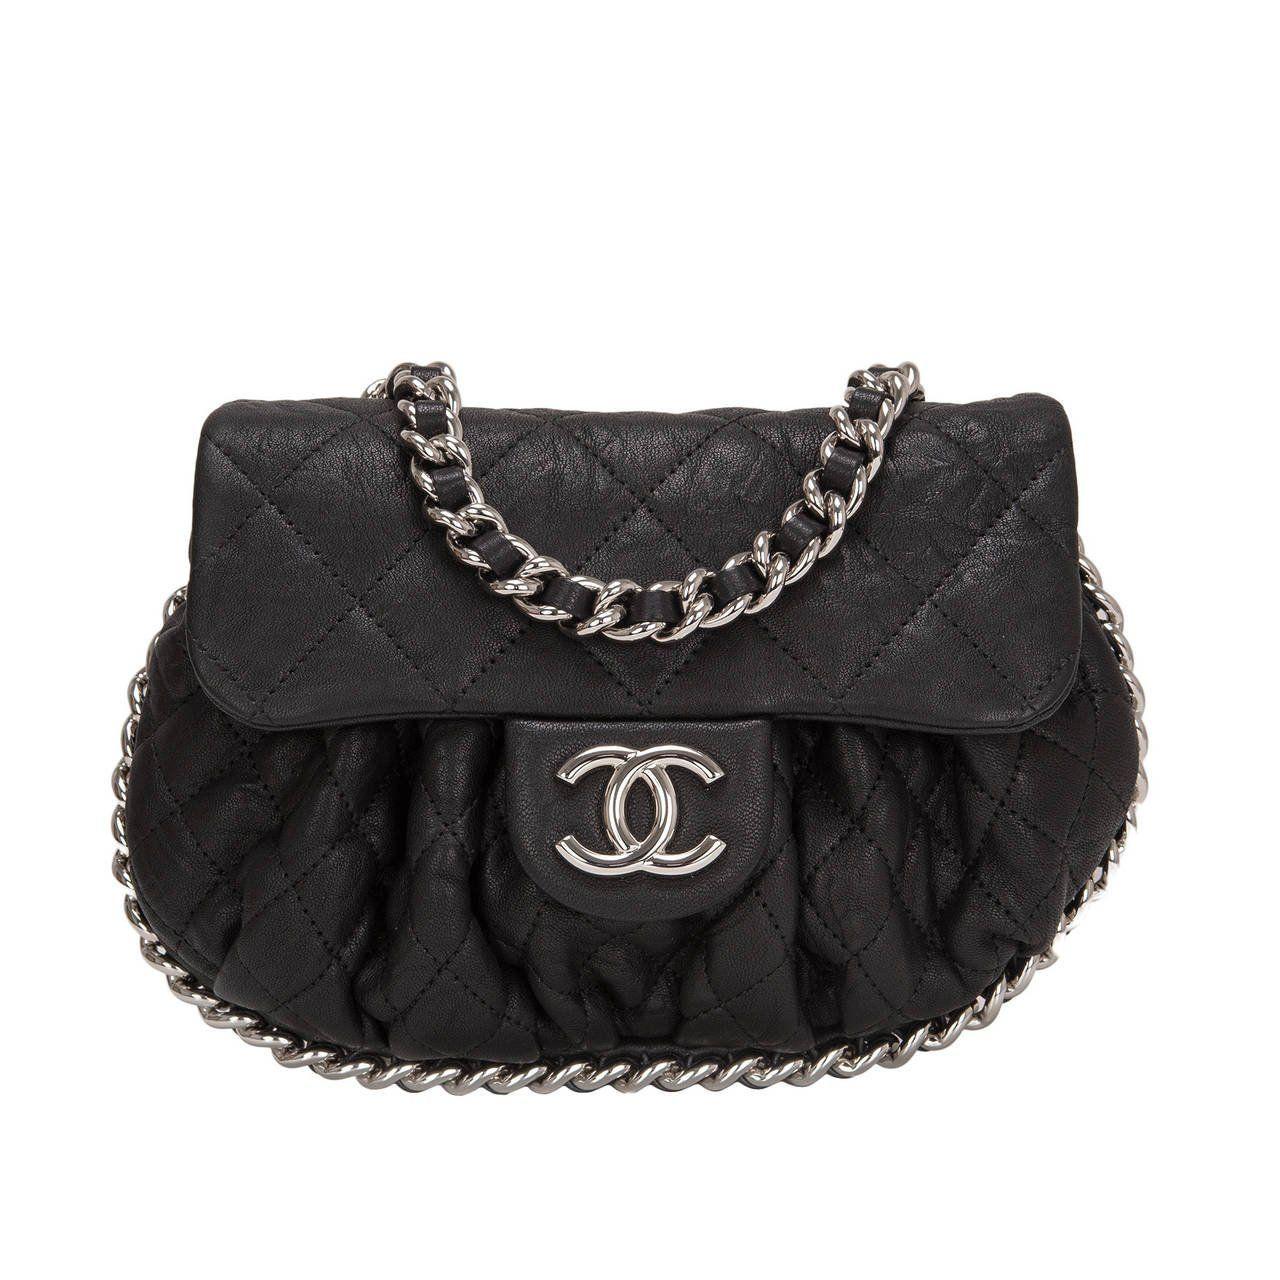 1ddc9c265129 Chanel Navy Aged Lambskin Chain Around Mini Crossbody Messenger Bag ...